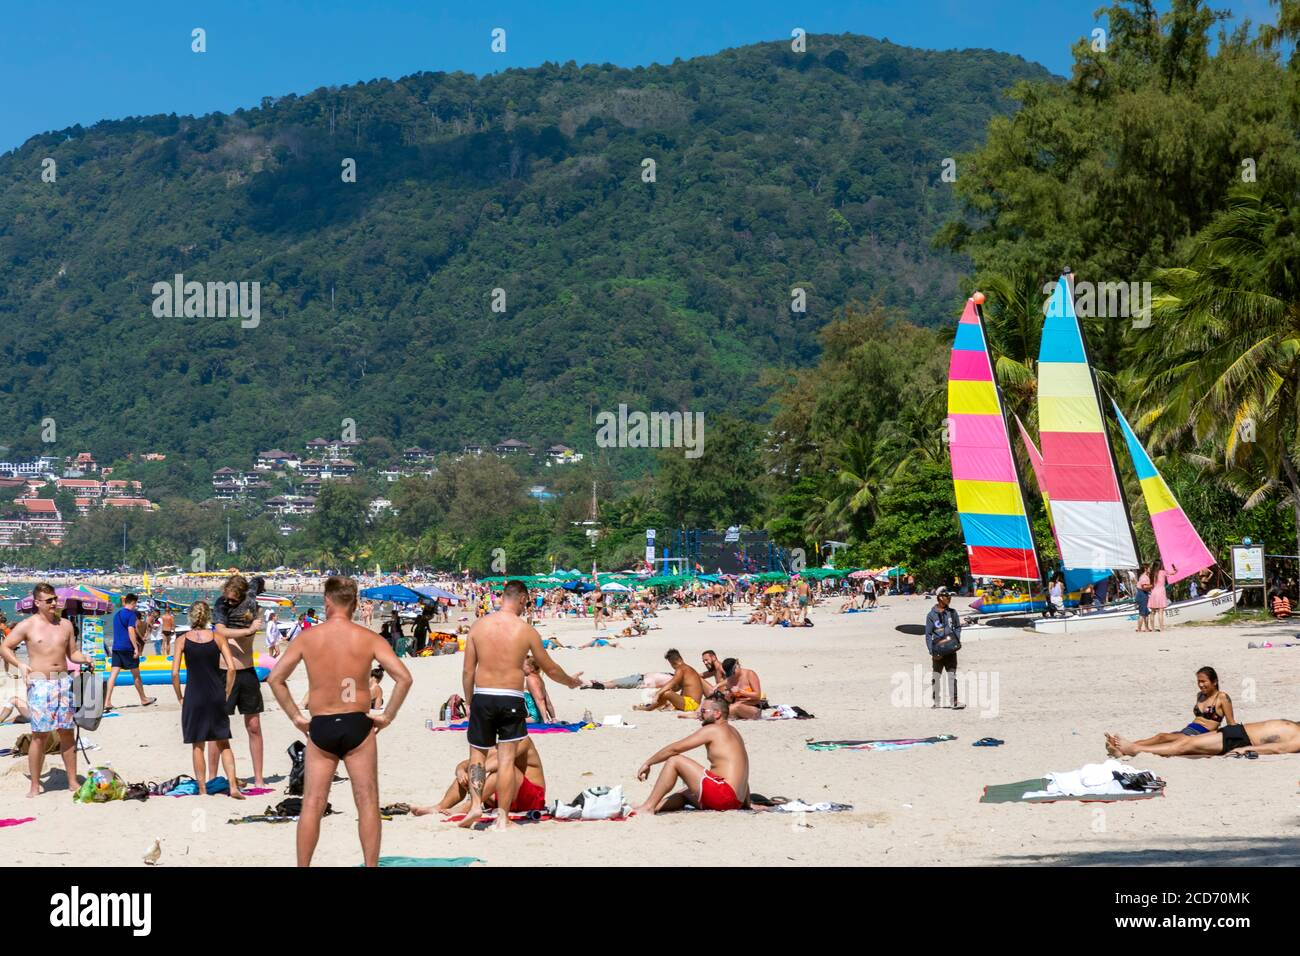 Tourists on the beach at Patong, Phuket, Thailand Stock Photo